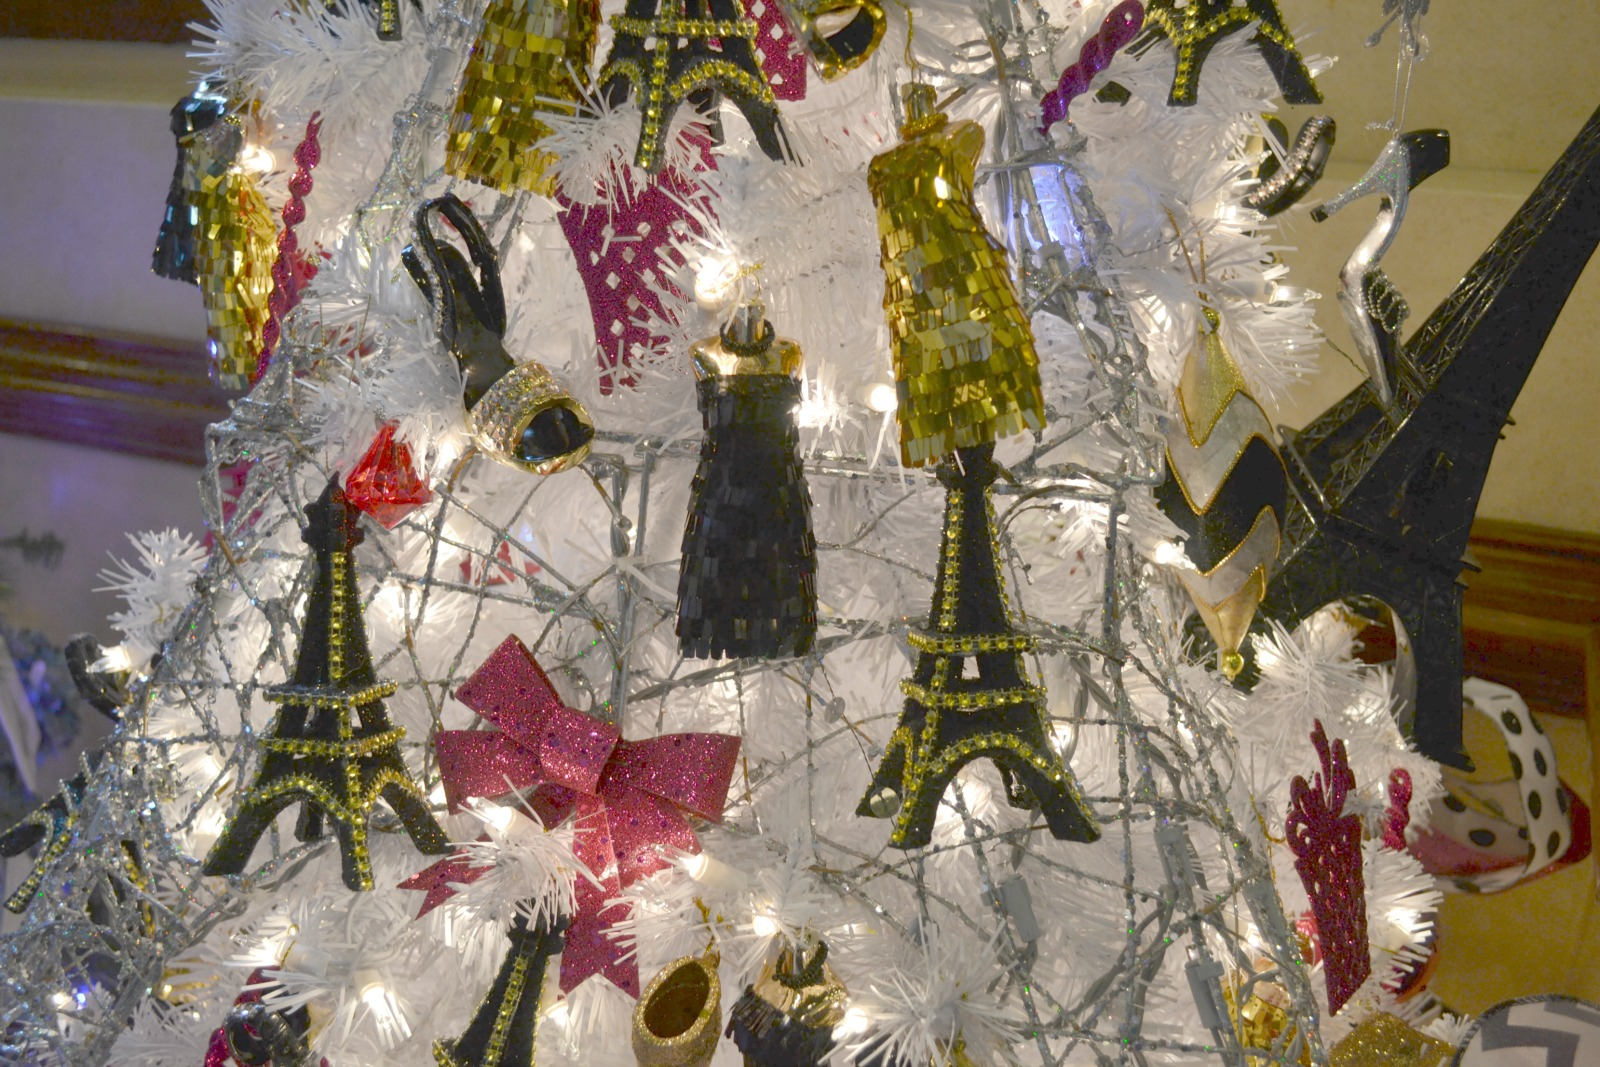 close-up of PARIS themed tree